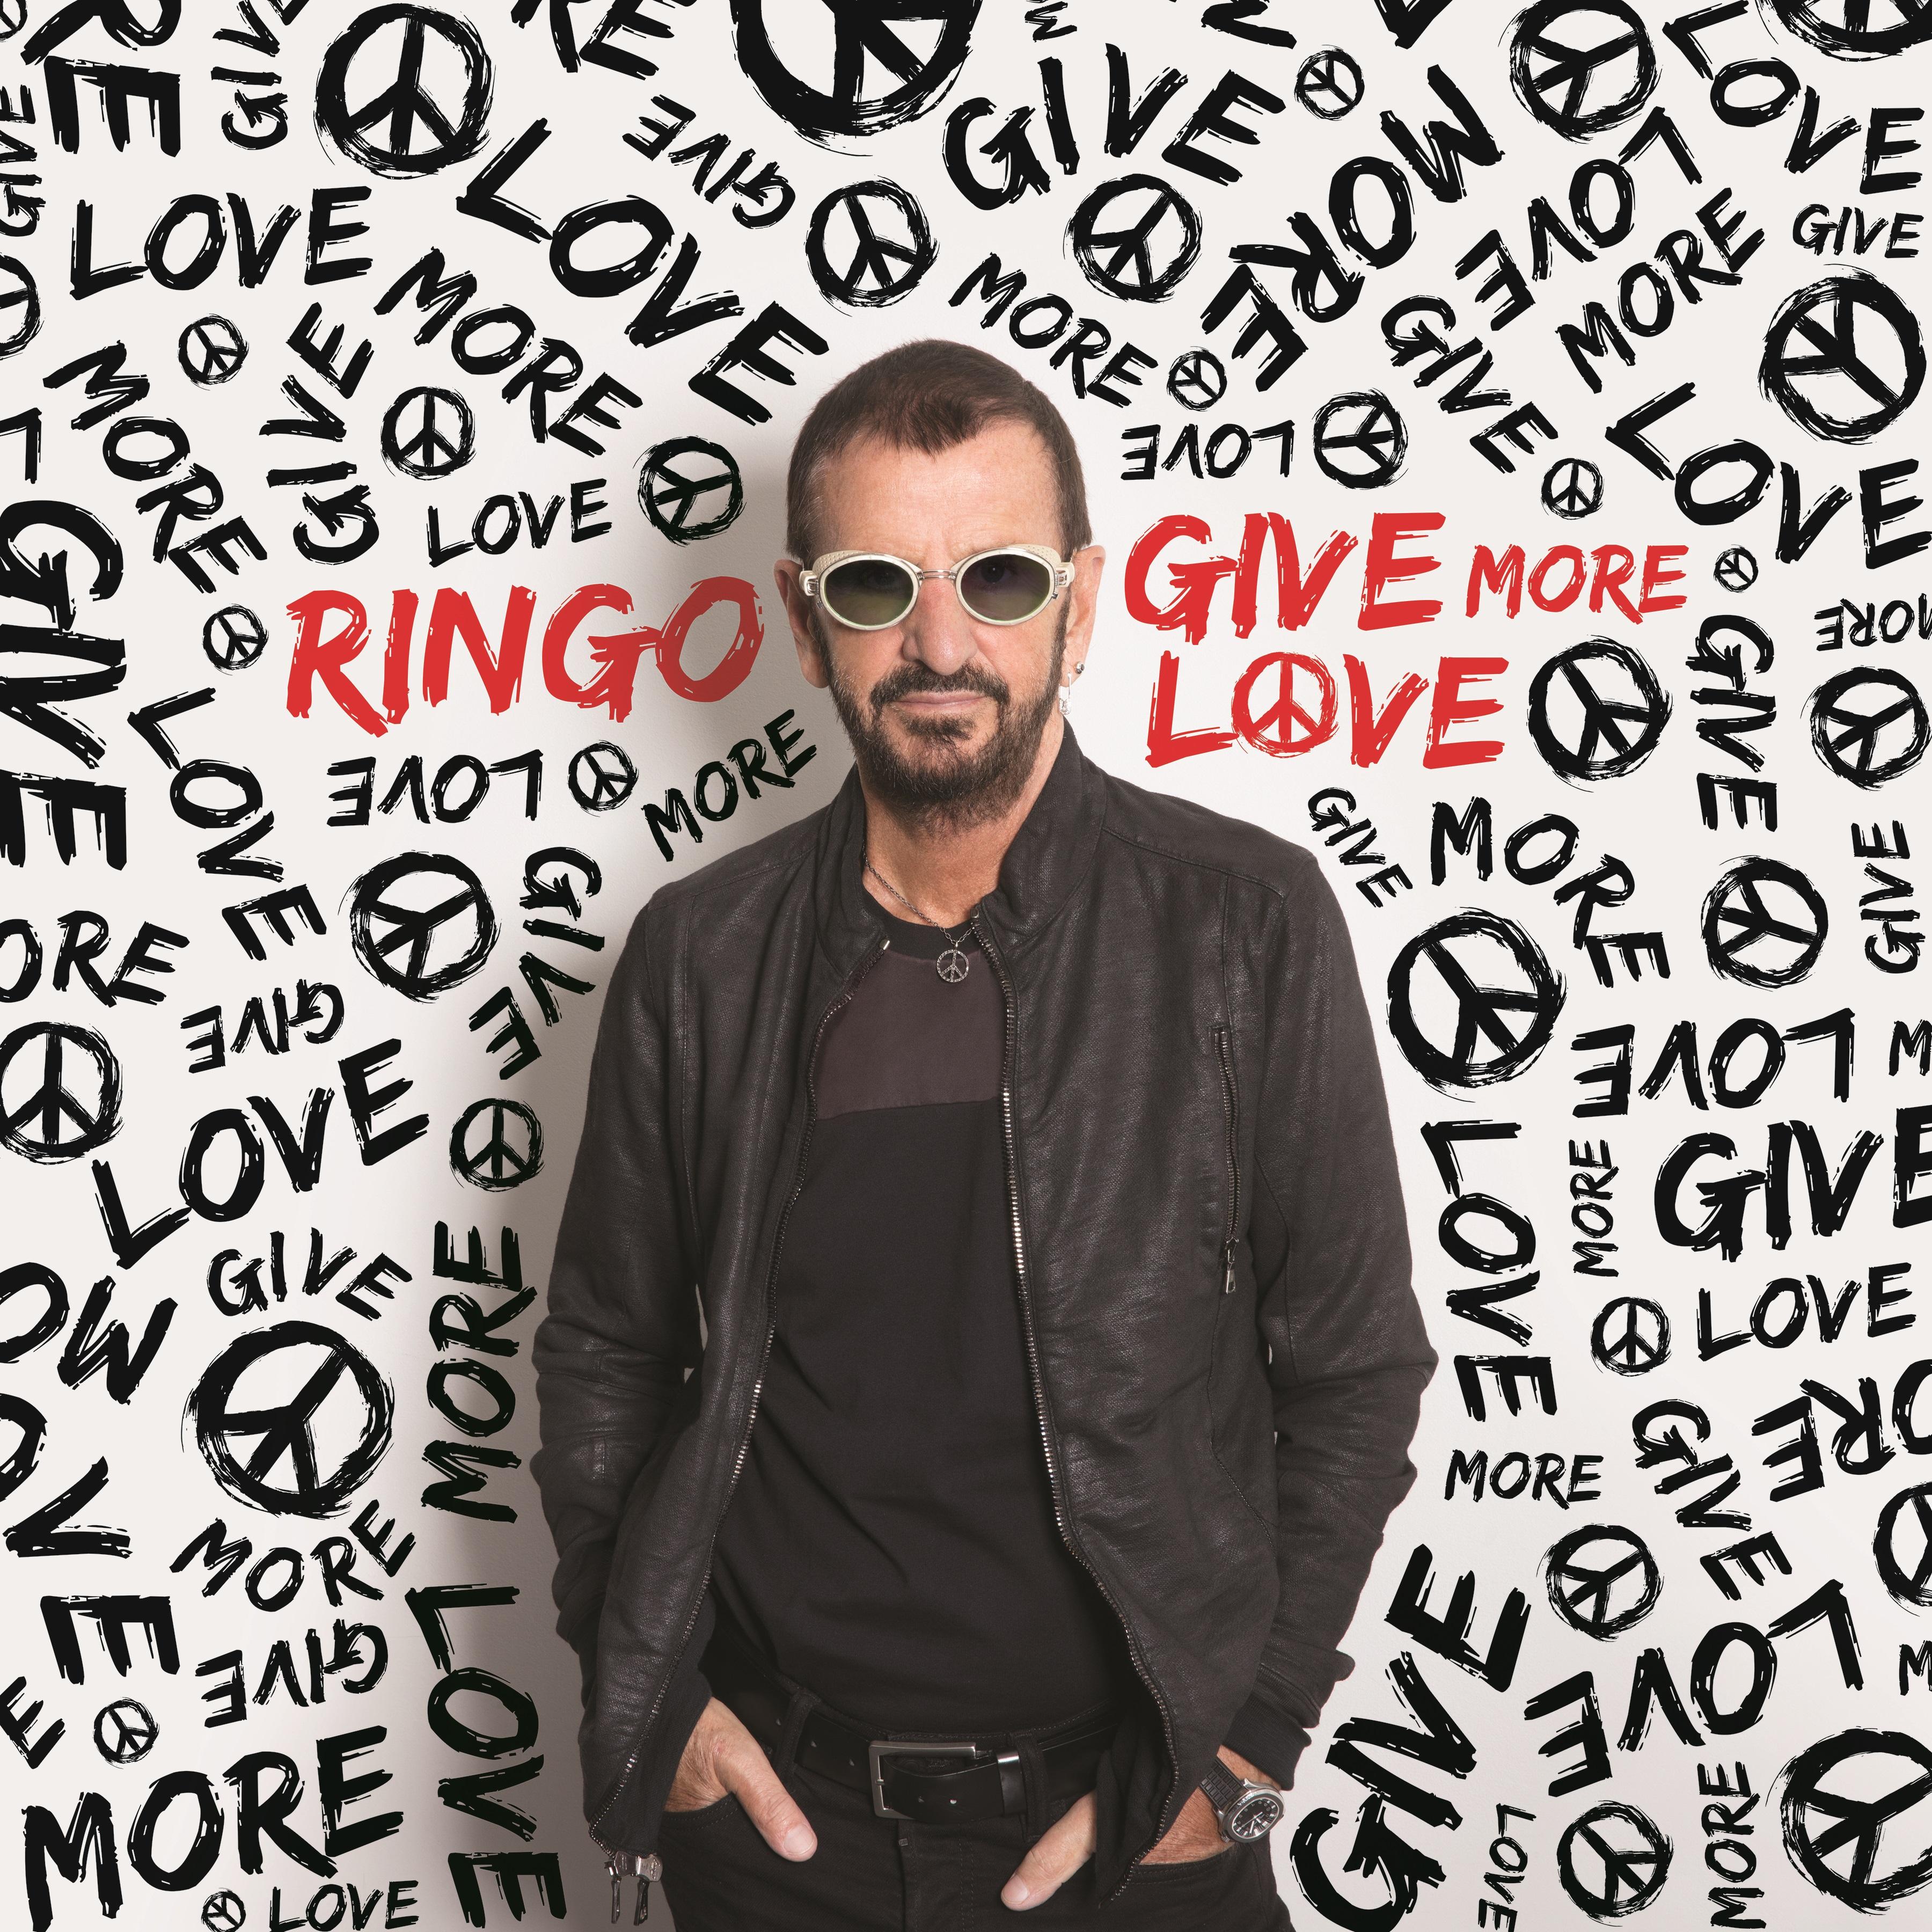 cover art-Ringo Starr-Give More Love